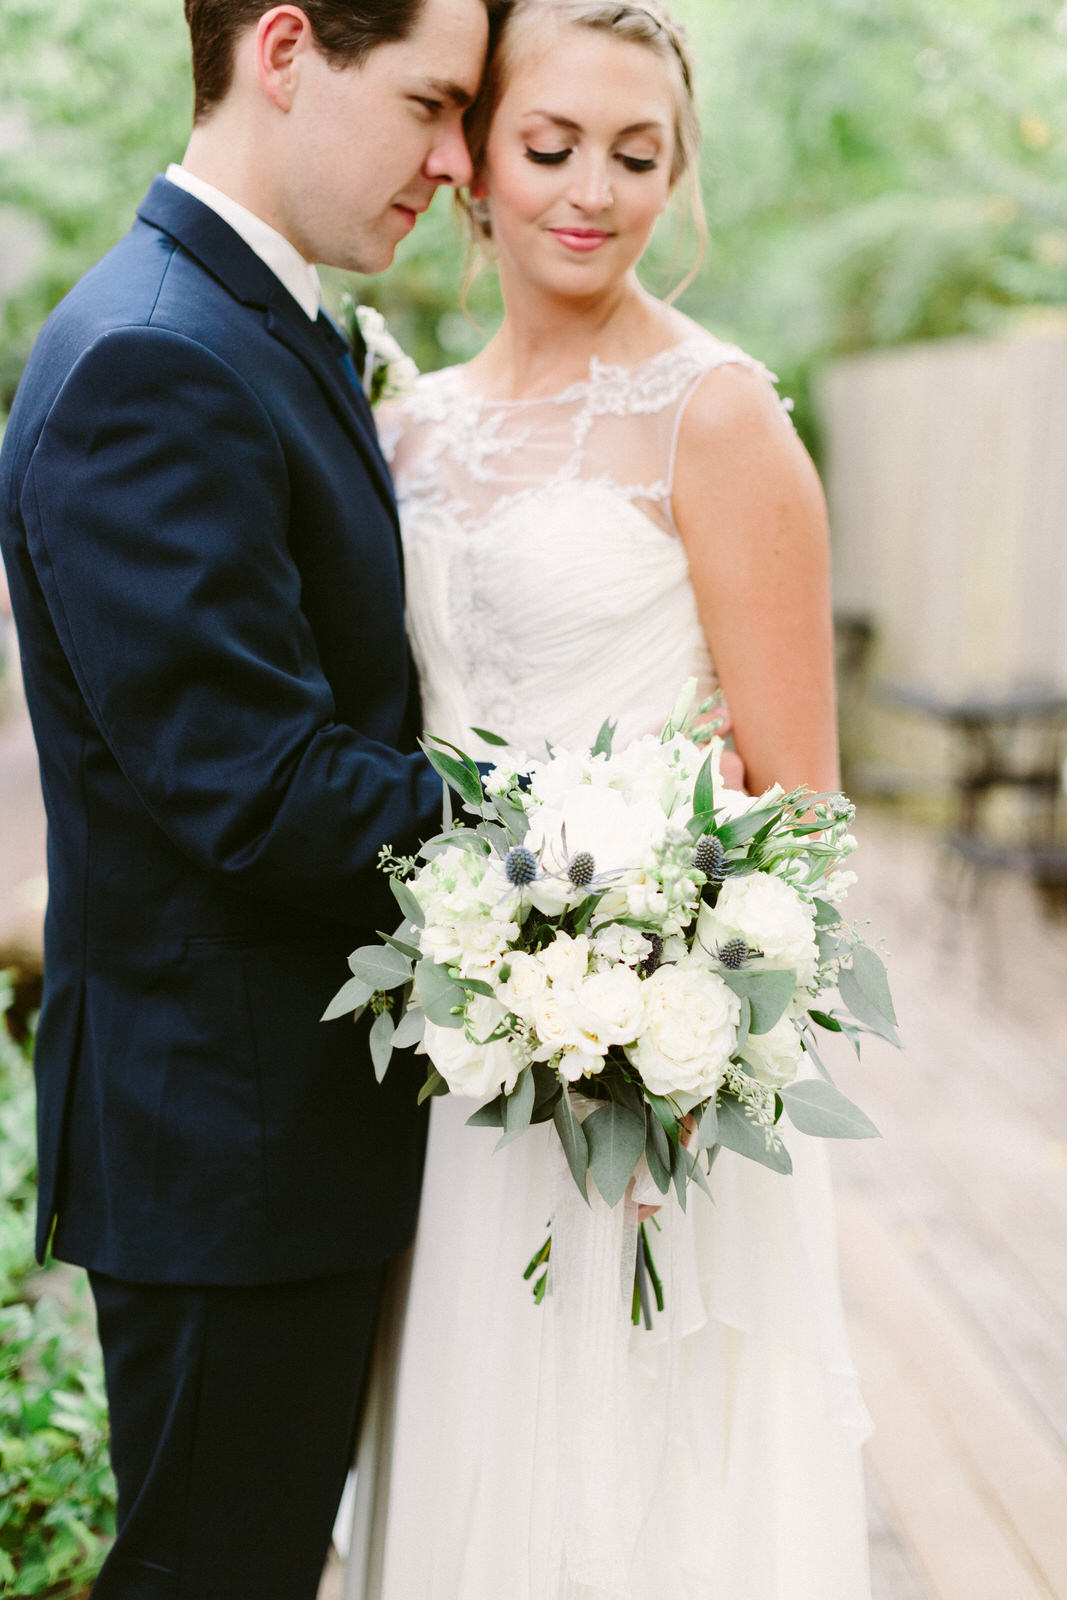 KatiMallory-Fayetteville Wedding Florist-2043.JPG